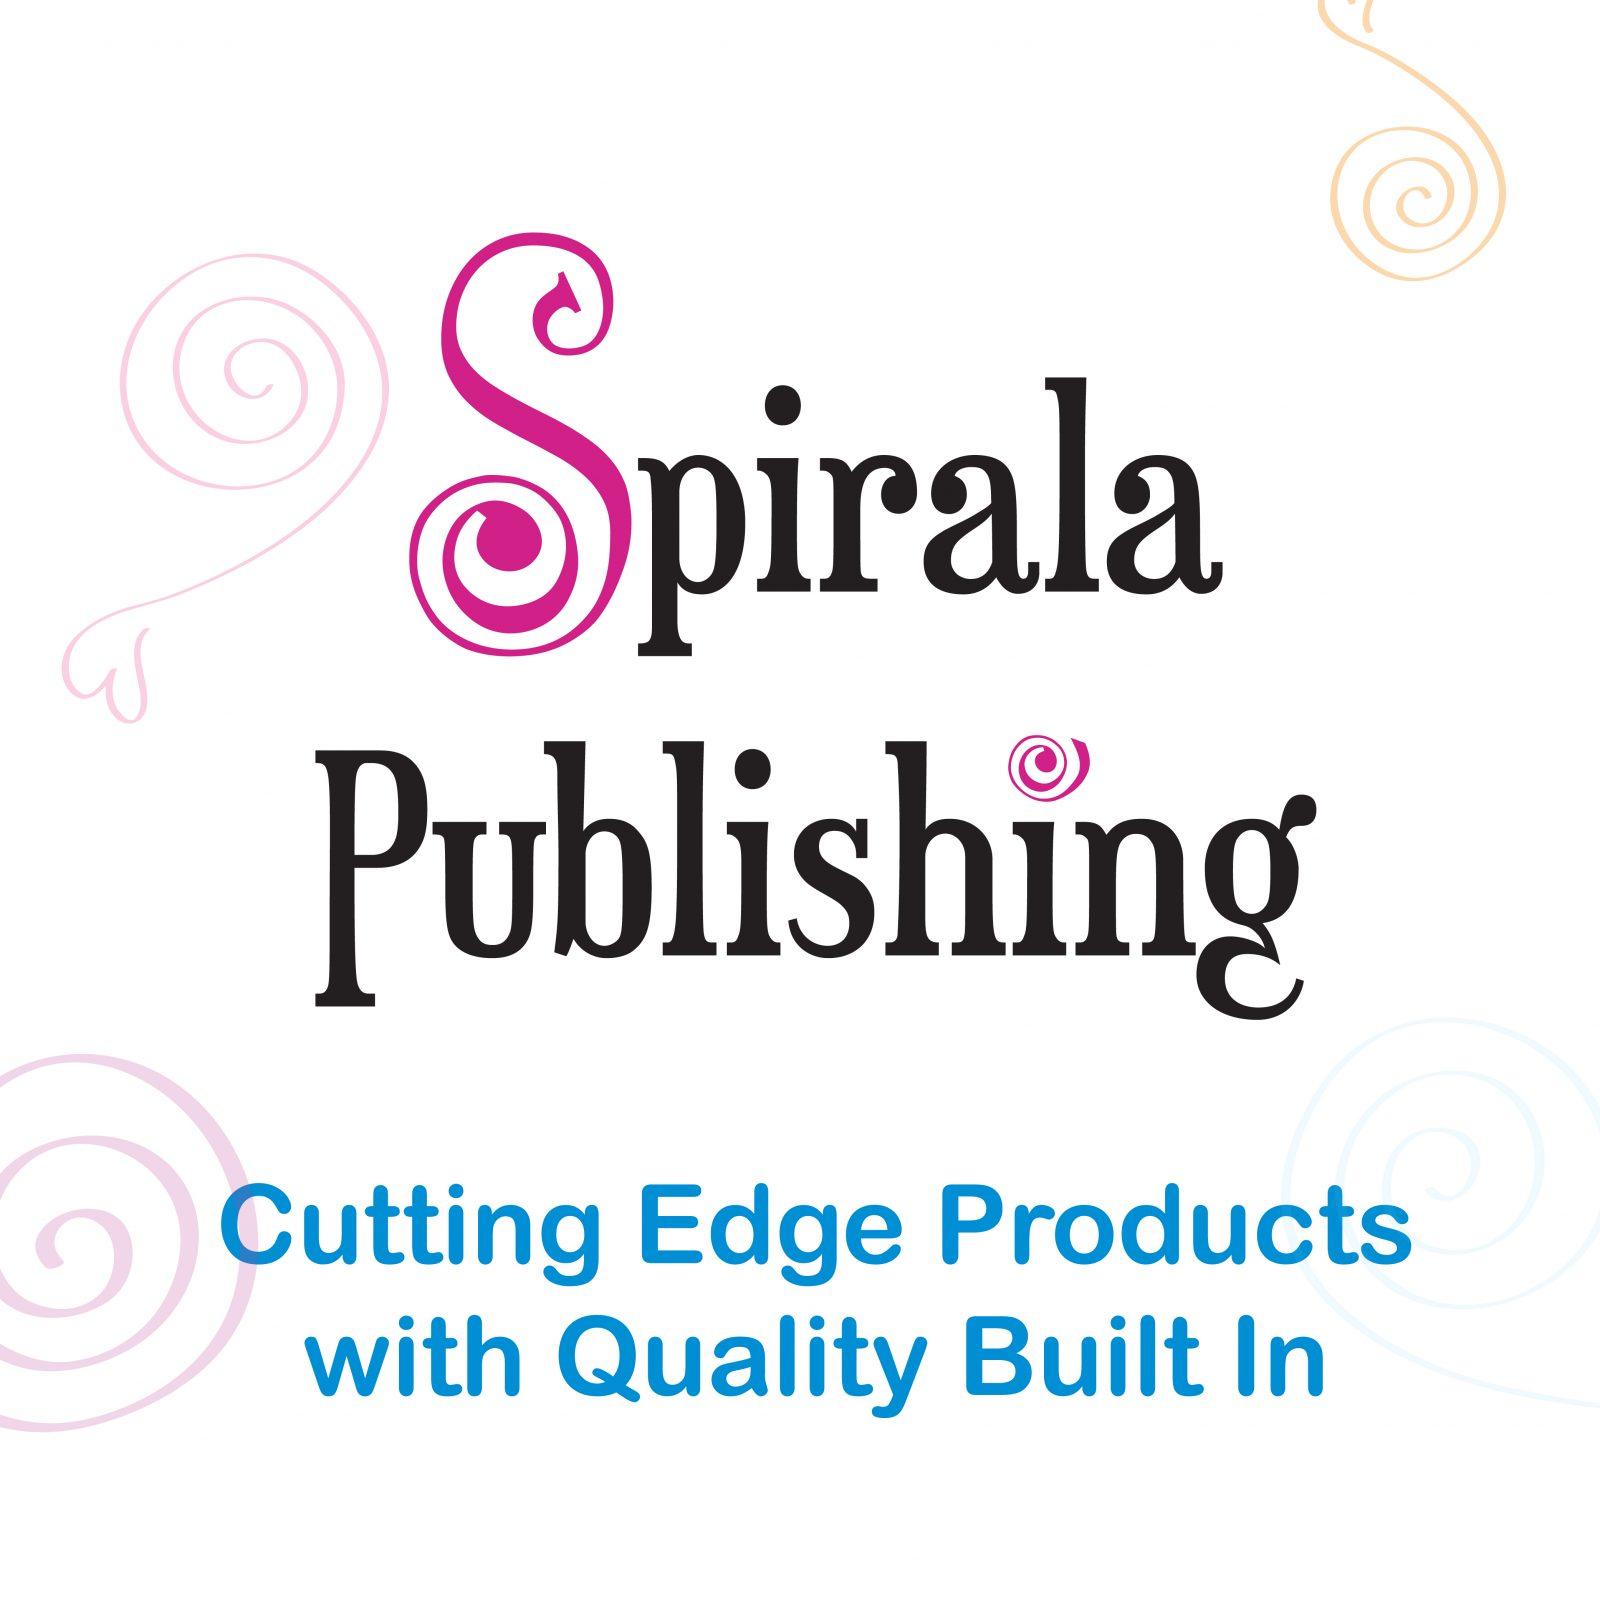 Spirala Publishing